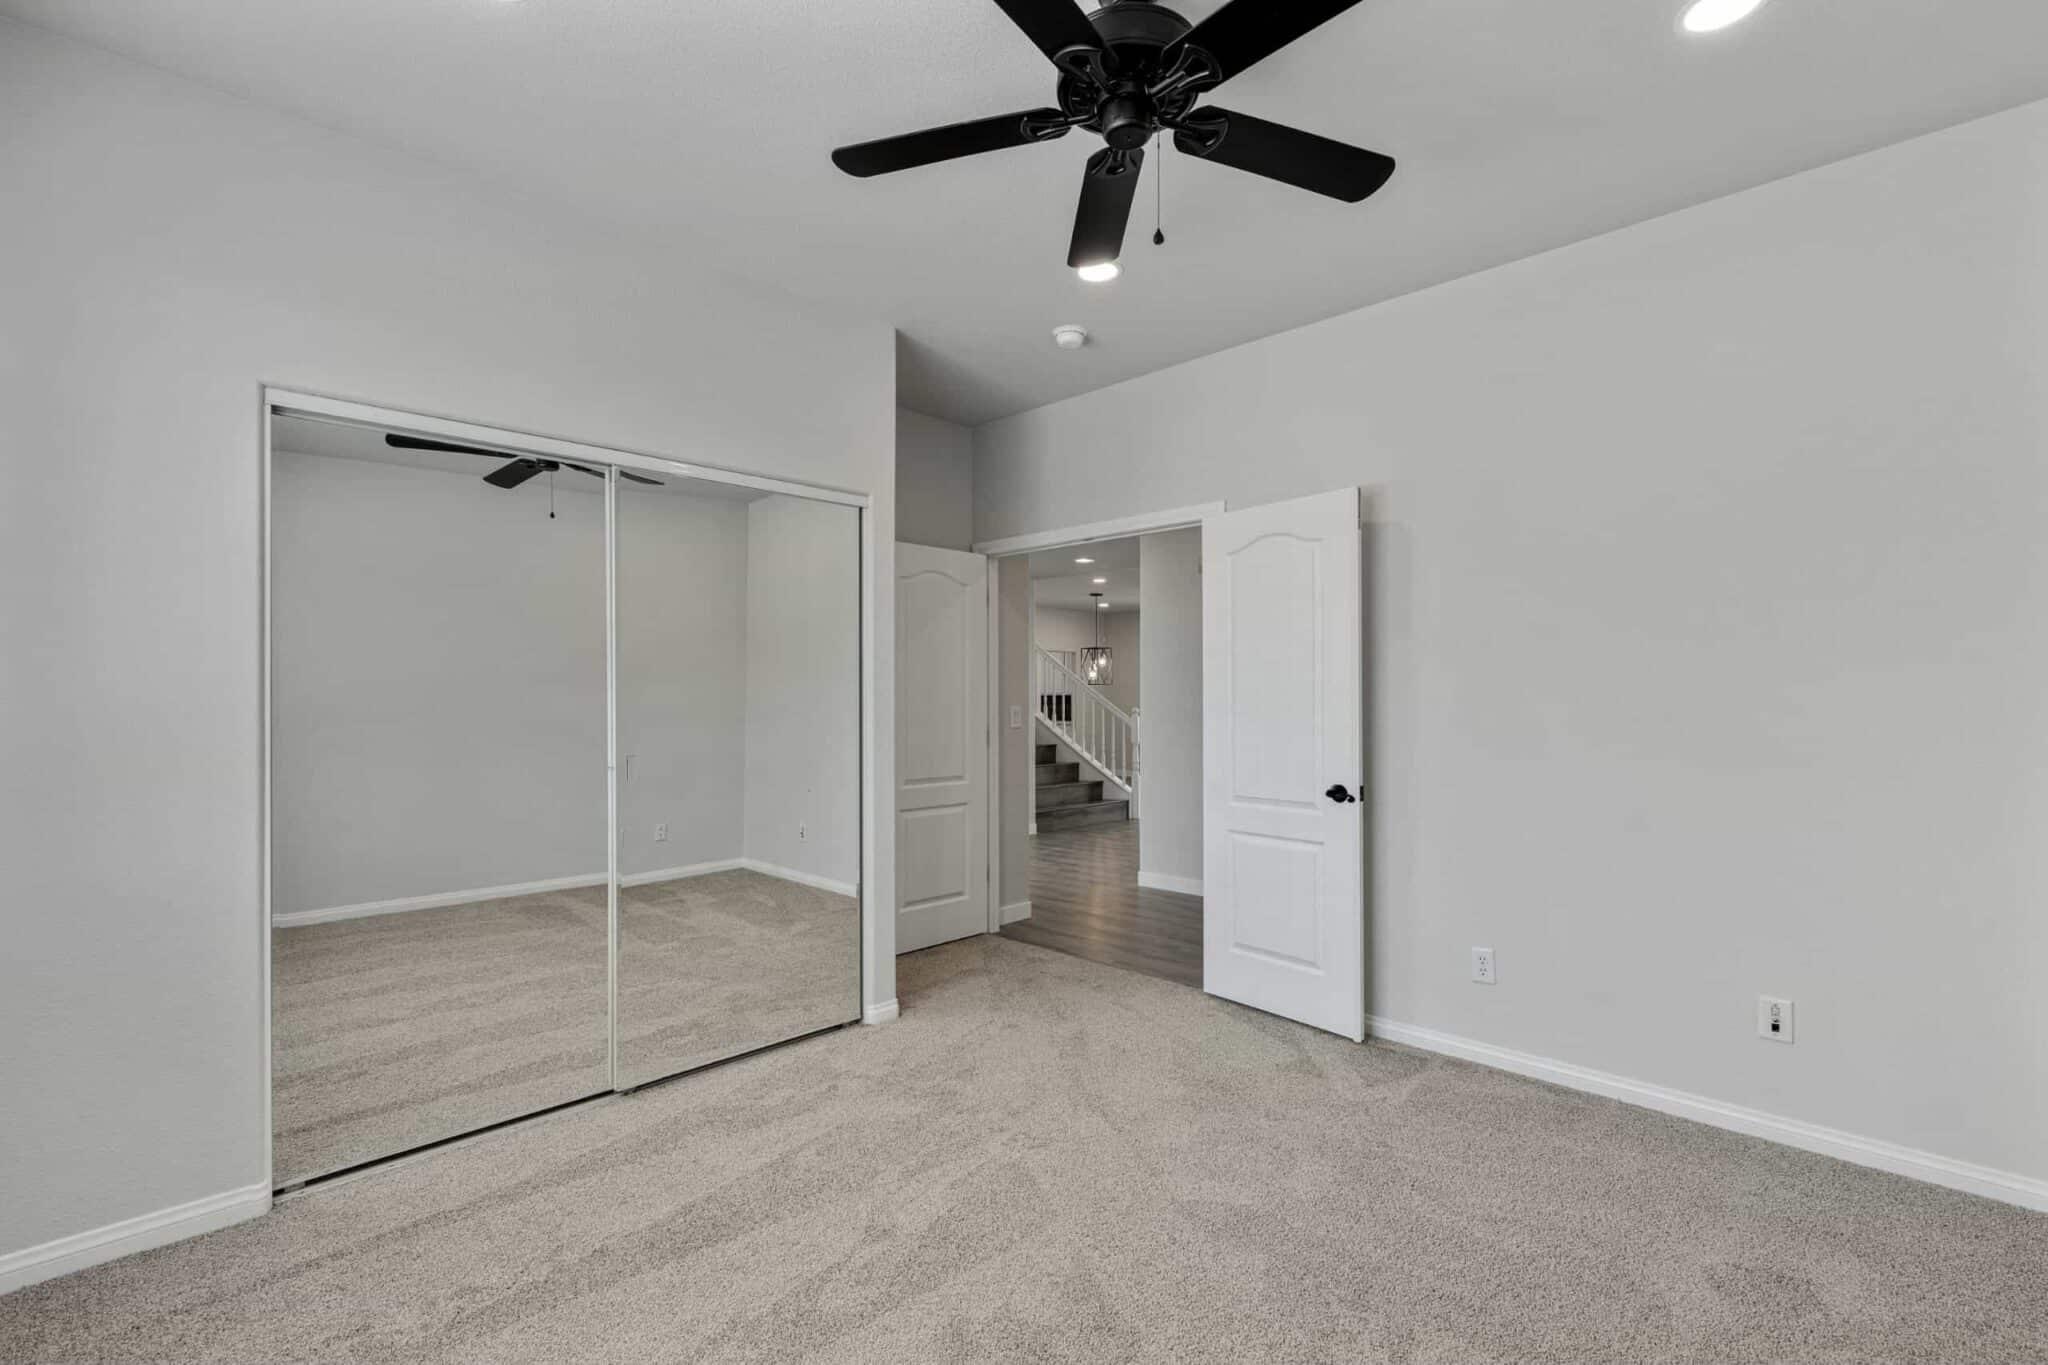 las-vegas-luxry-real-estate-realtor-rob-jensen-company-10491-haywood-drive-summerlin11